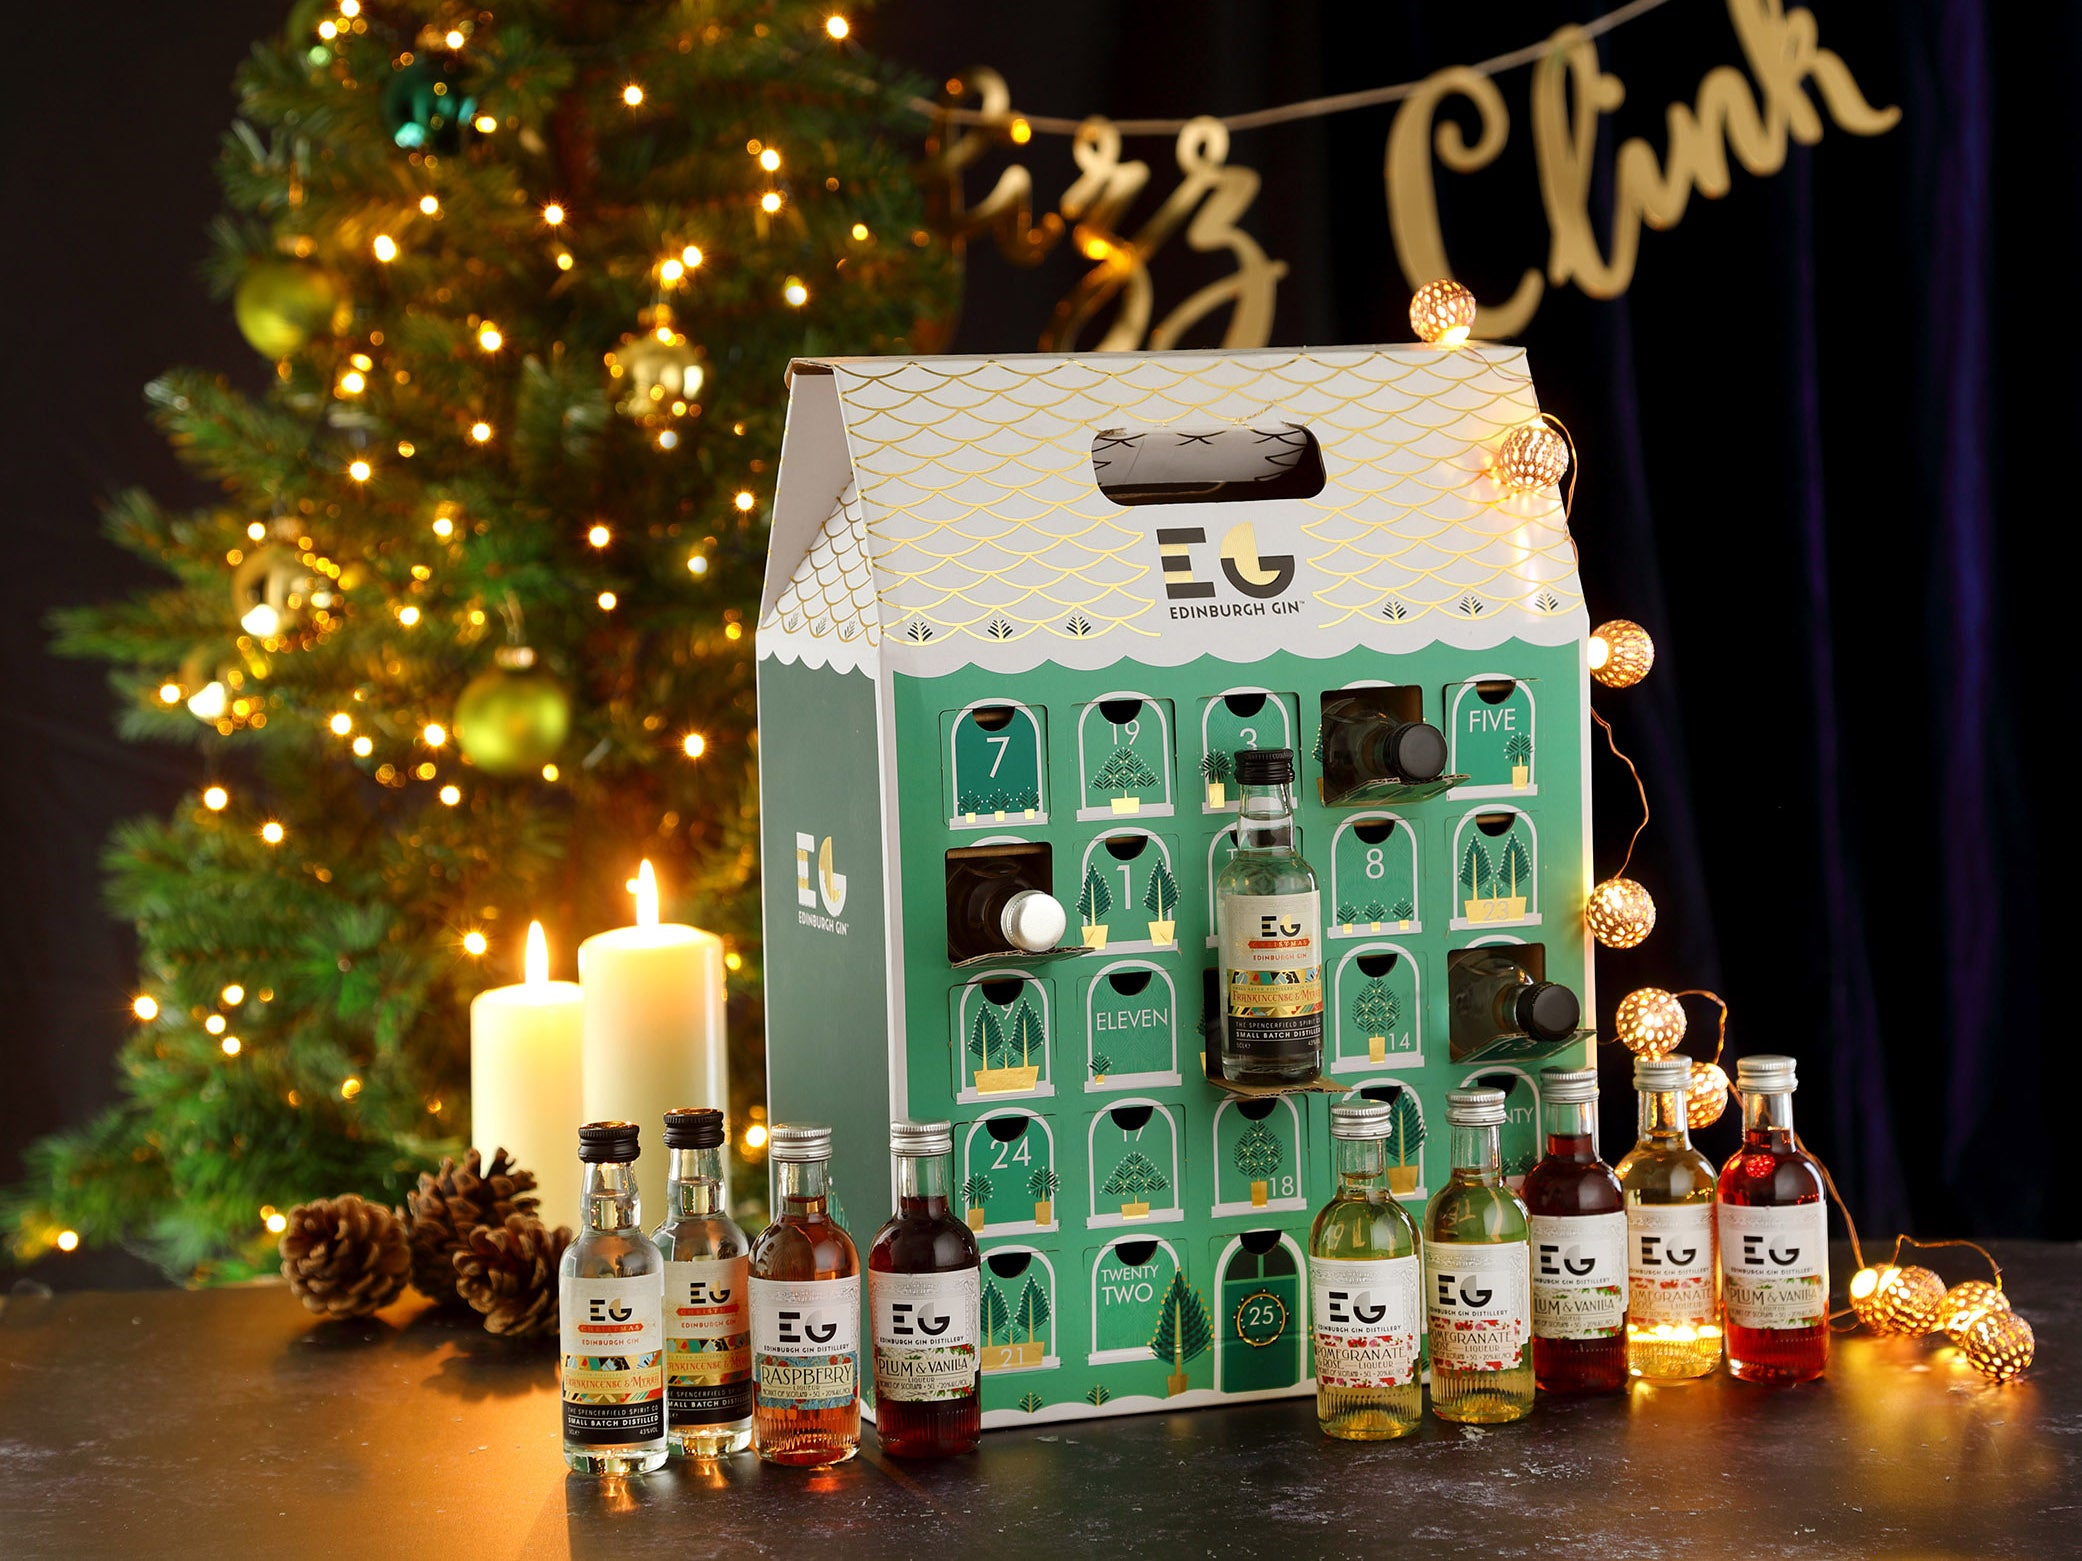 10 Best Alcoholic Advent Calendars For Christmas 2018